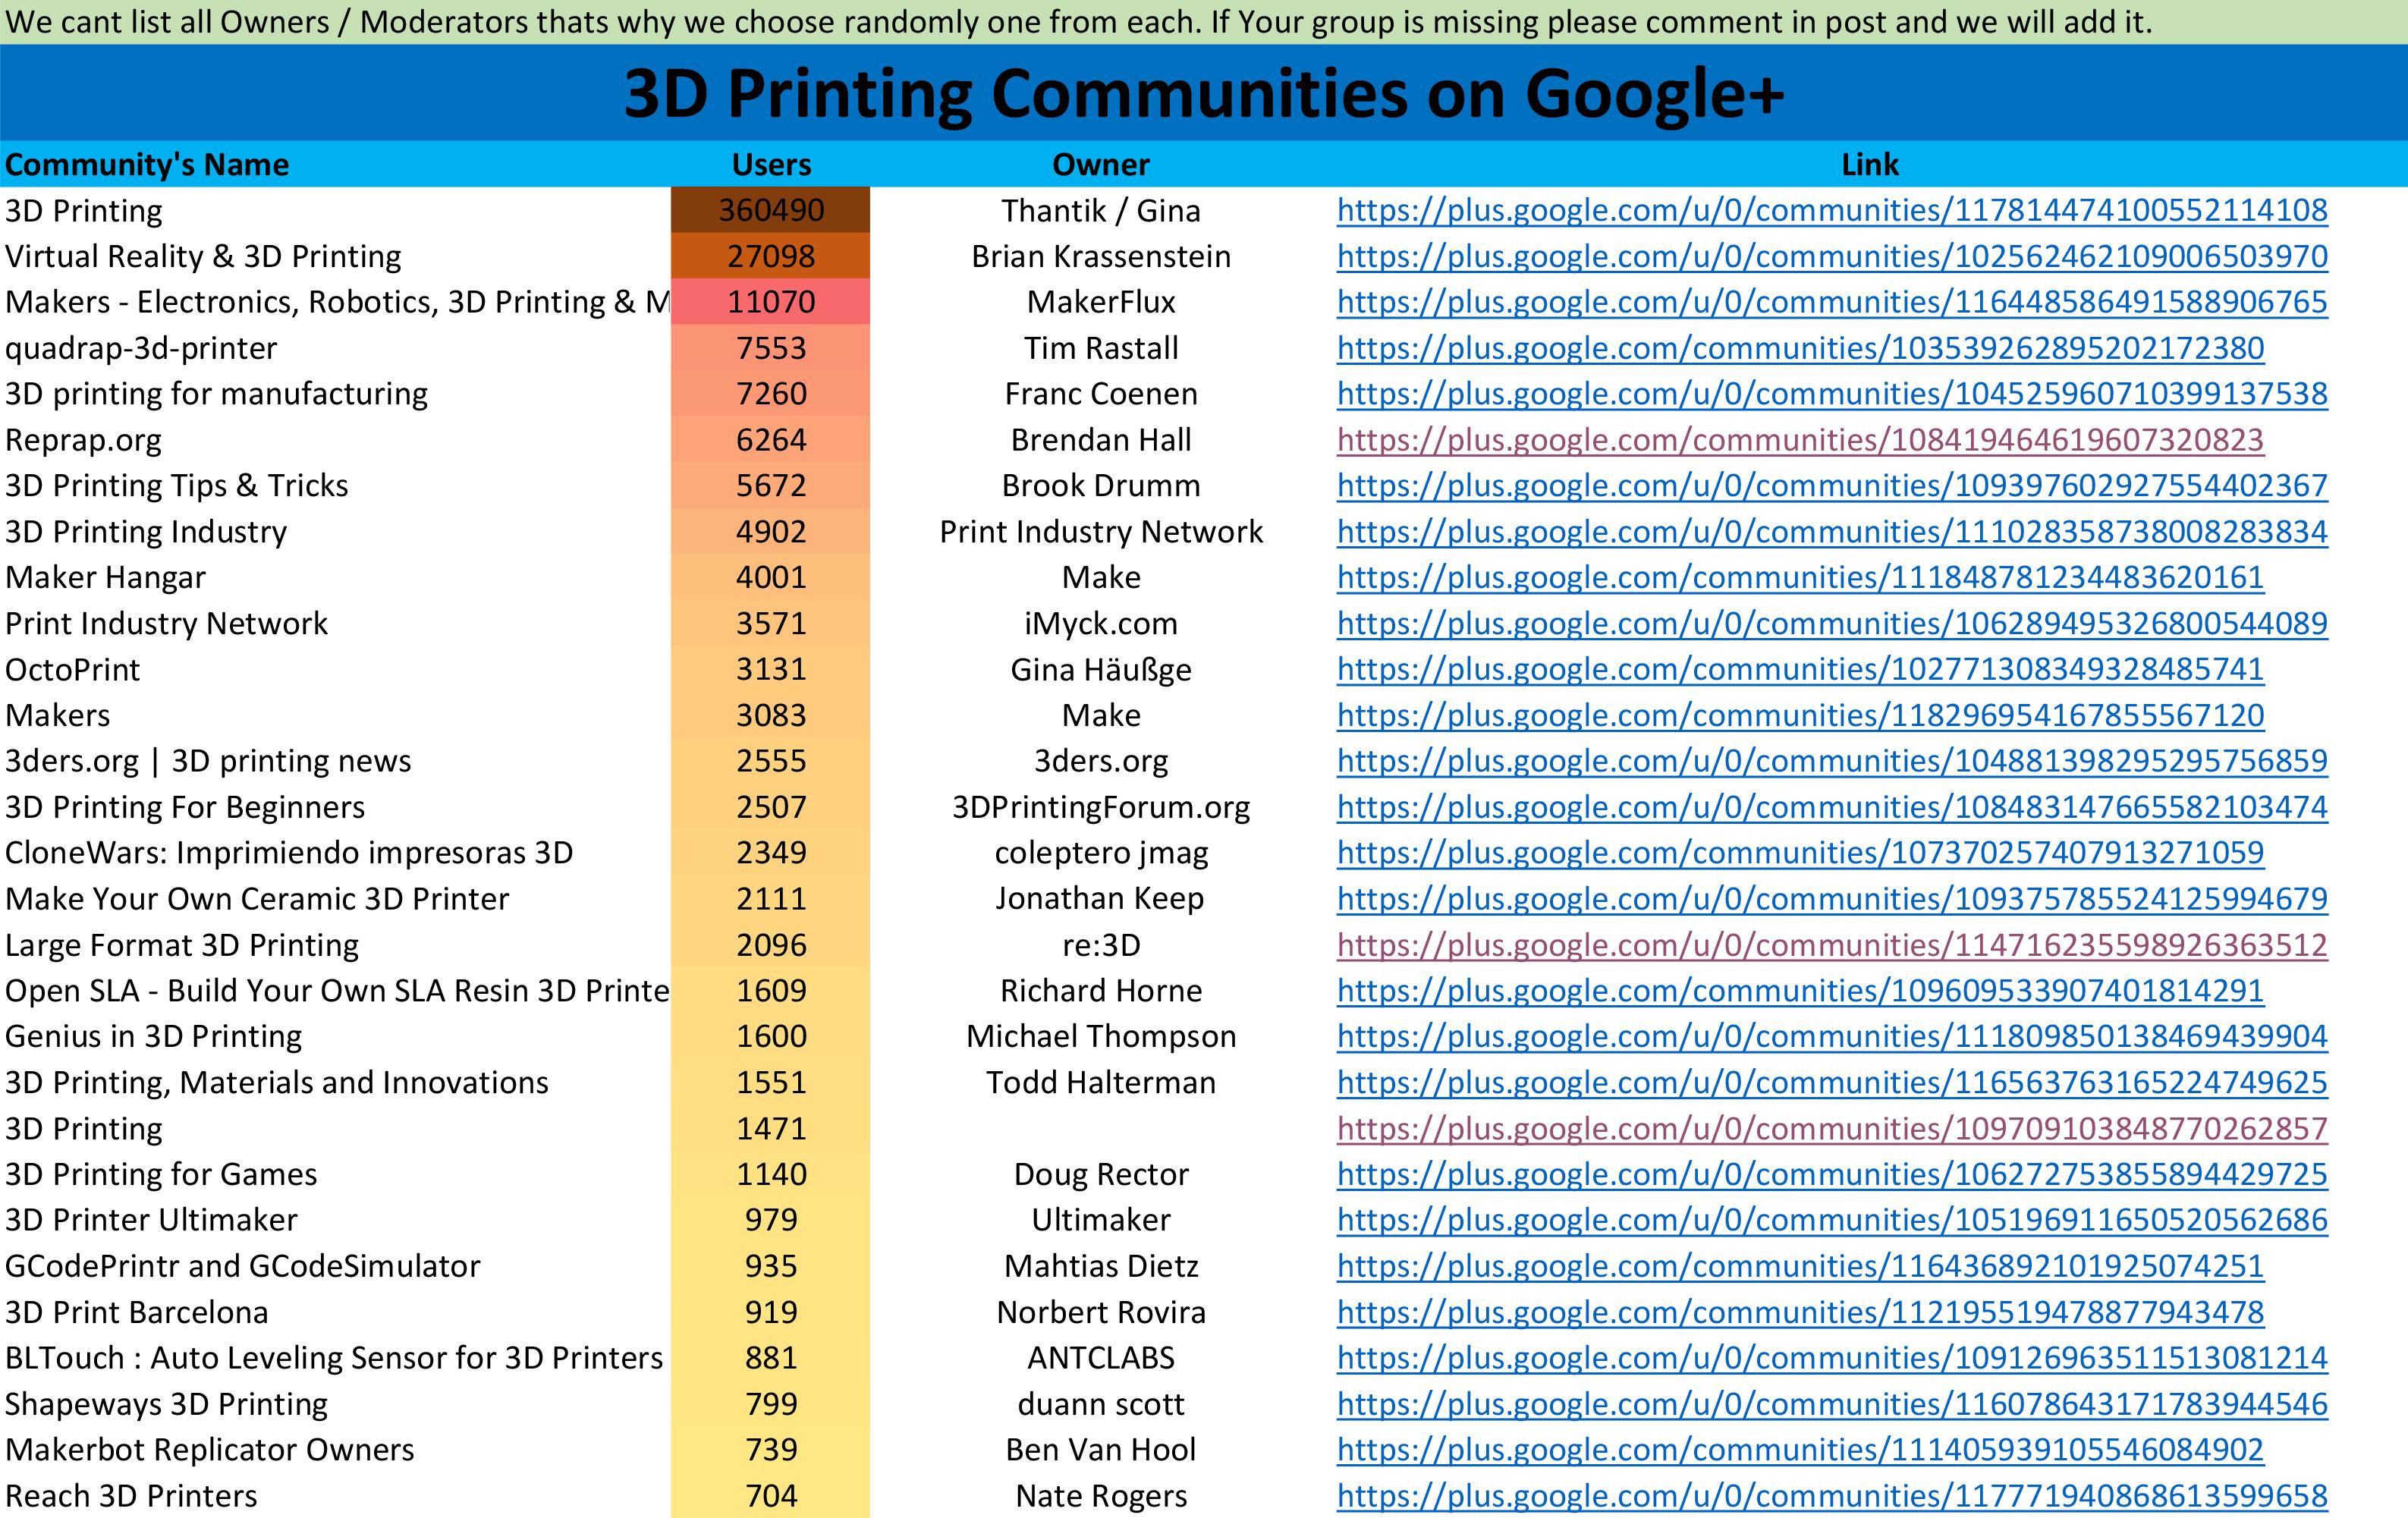 3dprinting communities on google+